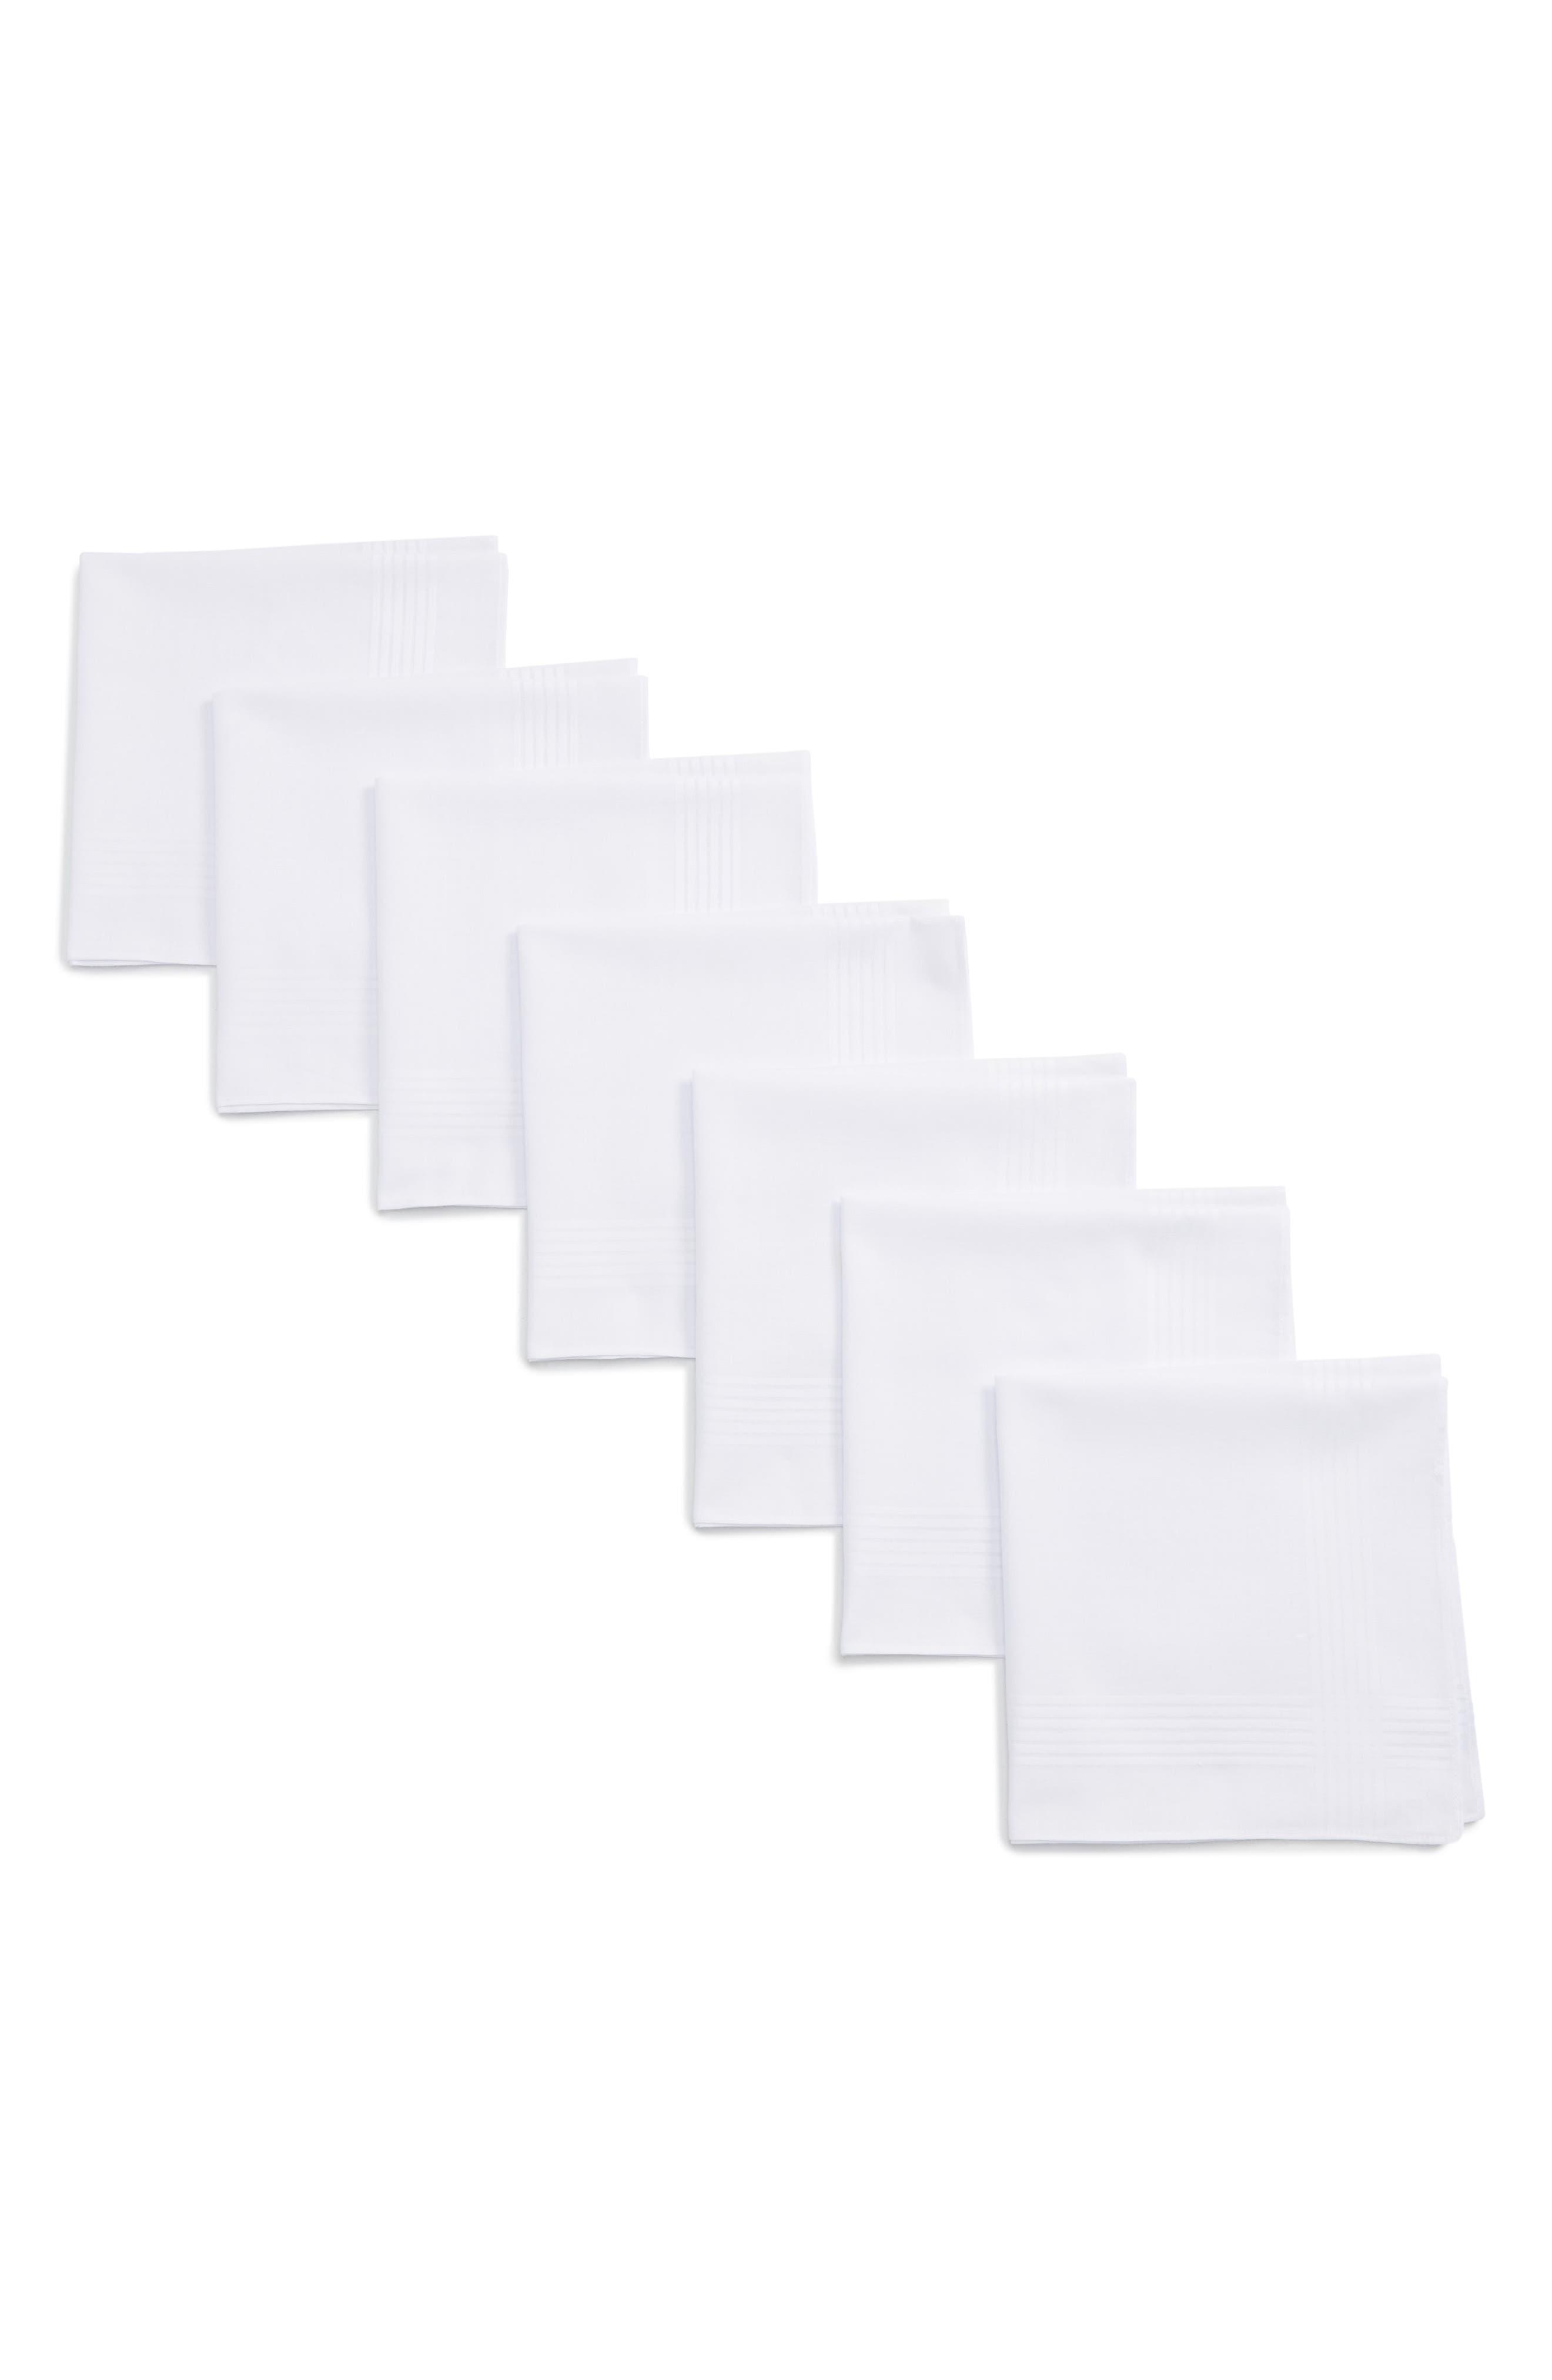 Alternate Image 1 Selected - Nordstrom Men's Shop 13-Pack Handkerchiefs